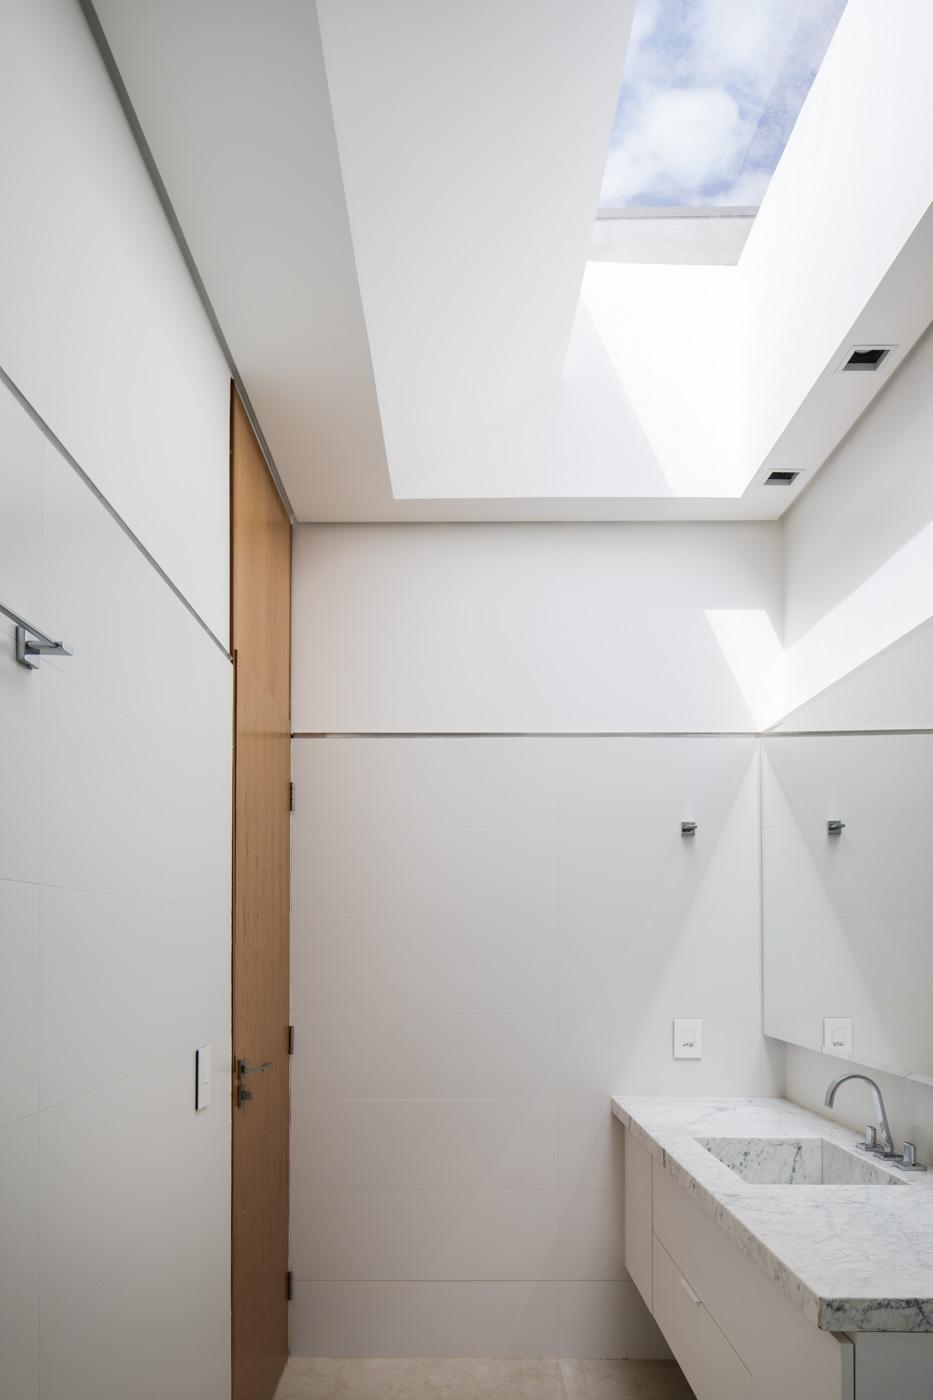 Mova-arquitetura-foto-haruo-mikami_B_068_Baixa.jpg